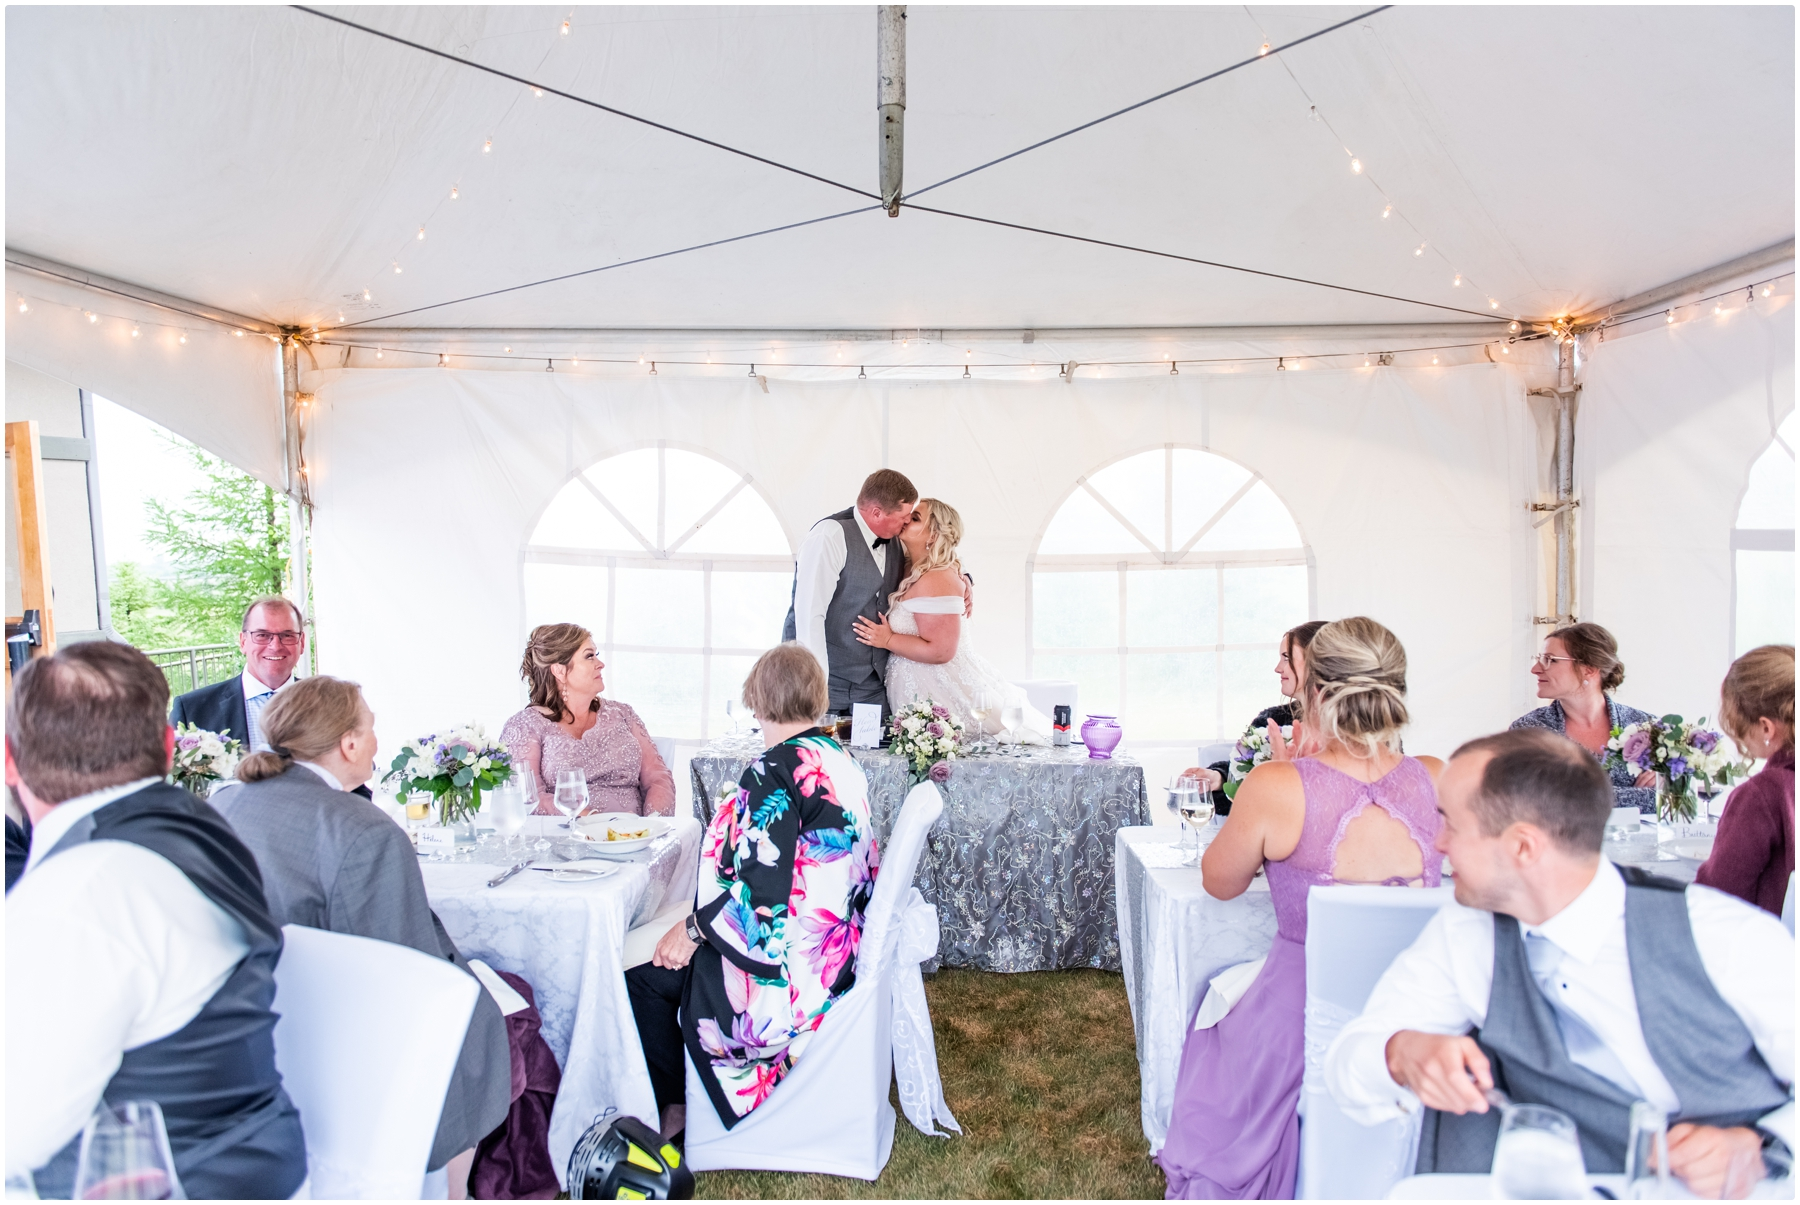 Calgary Blue Devil Tent Wedding Venue